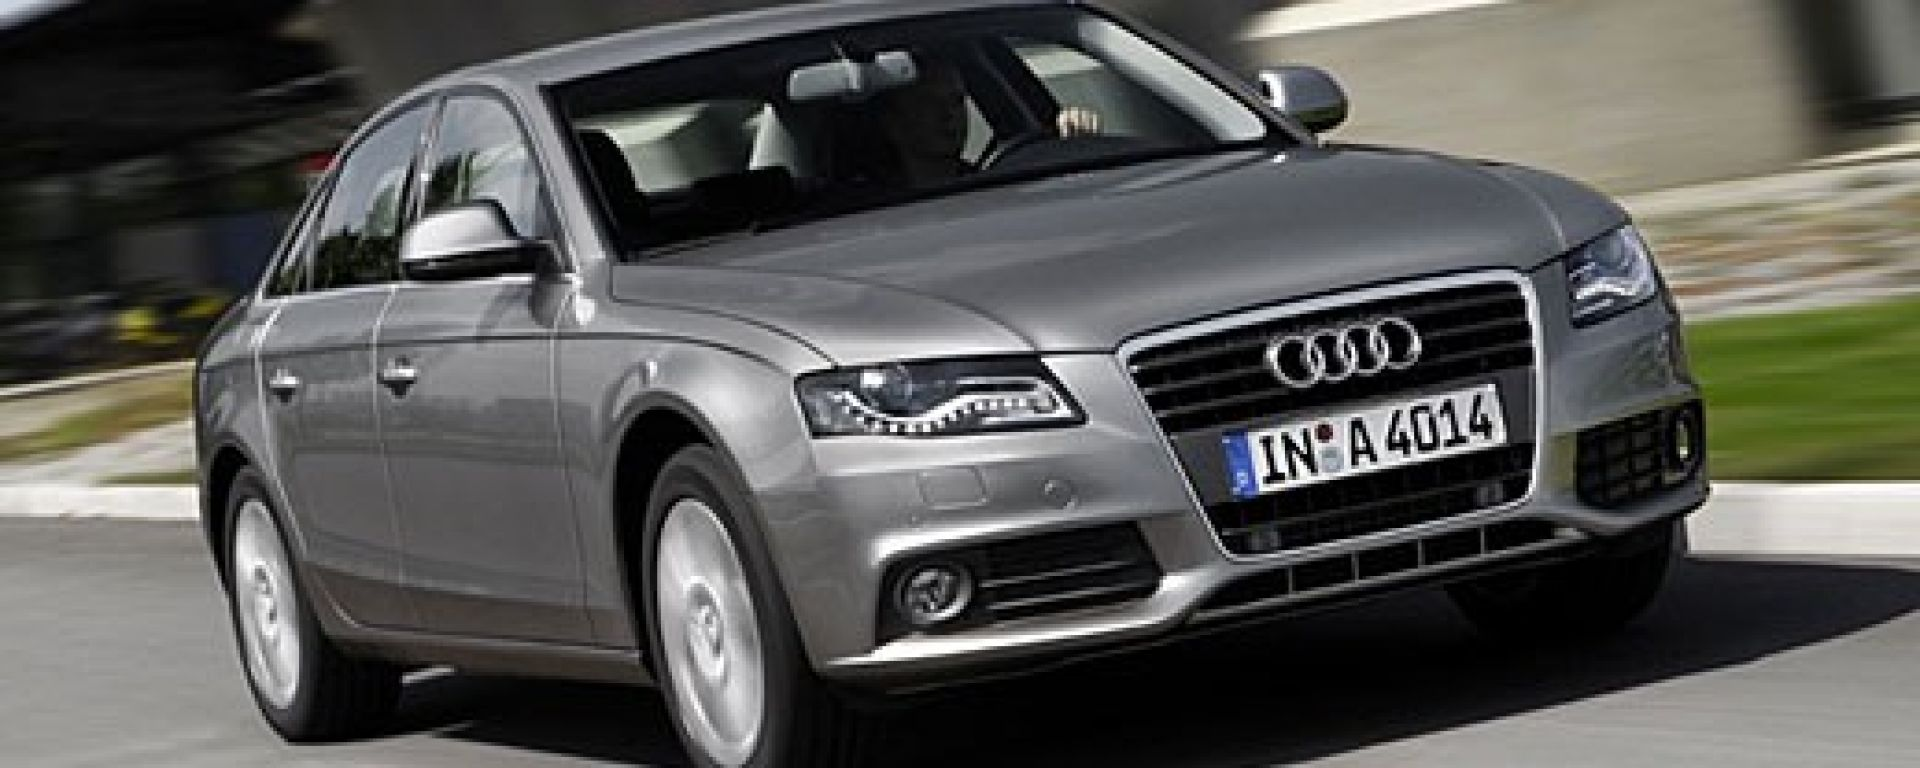 AUDI: motore più parco per l'A4 e A4 Avant